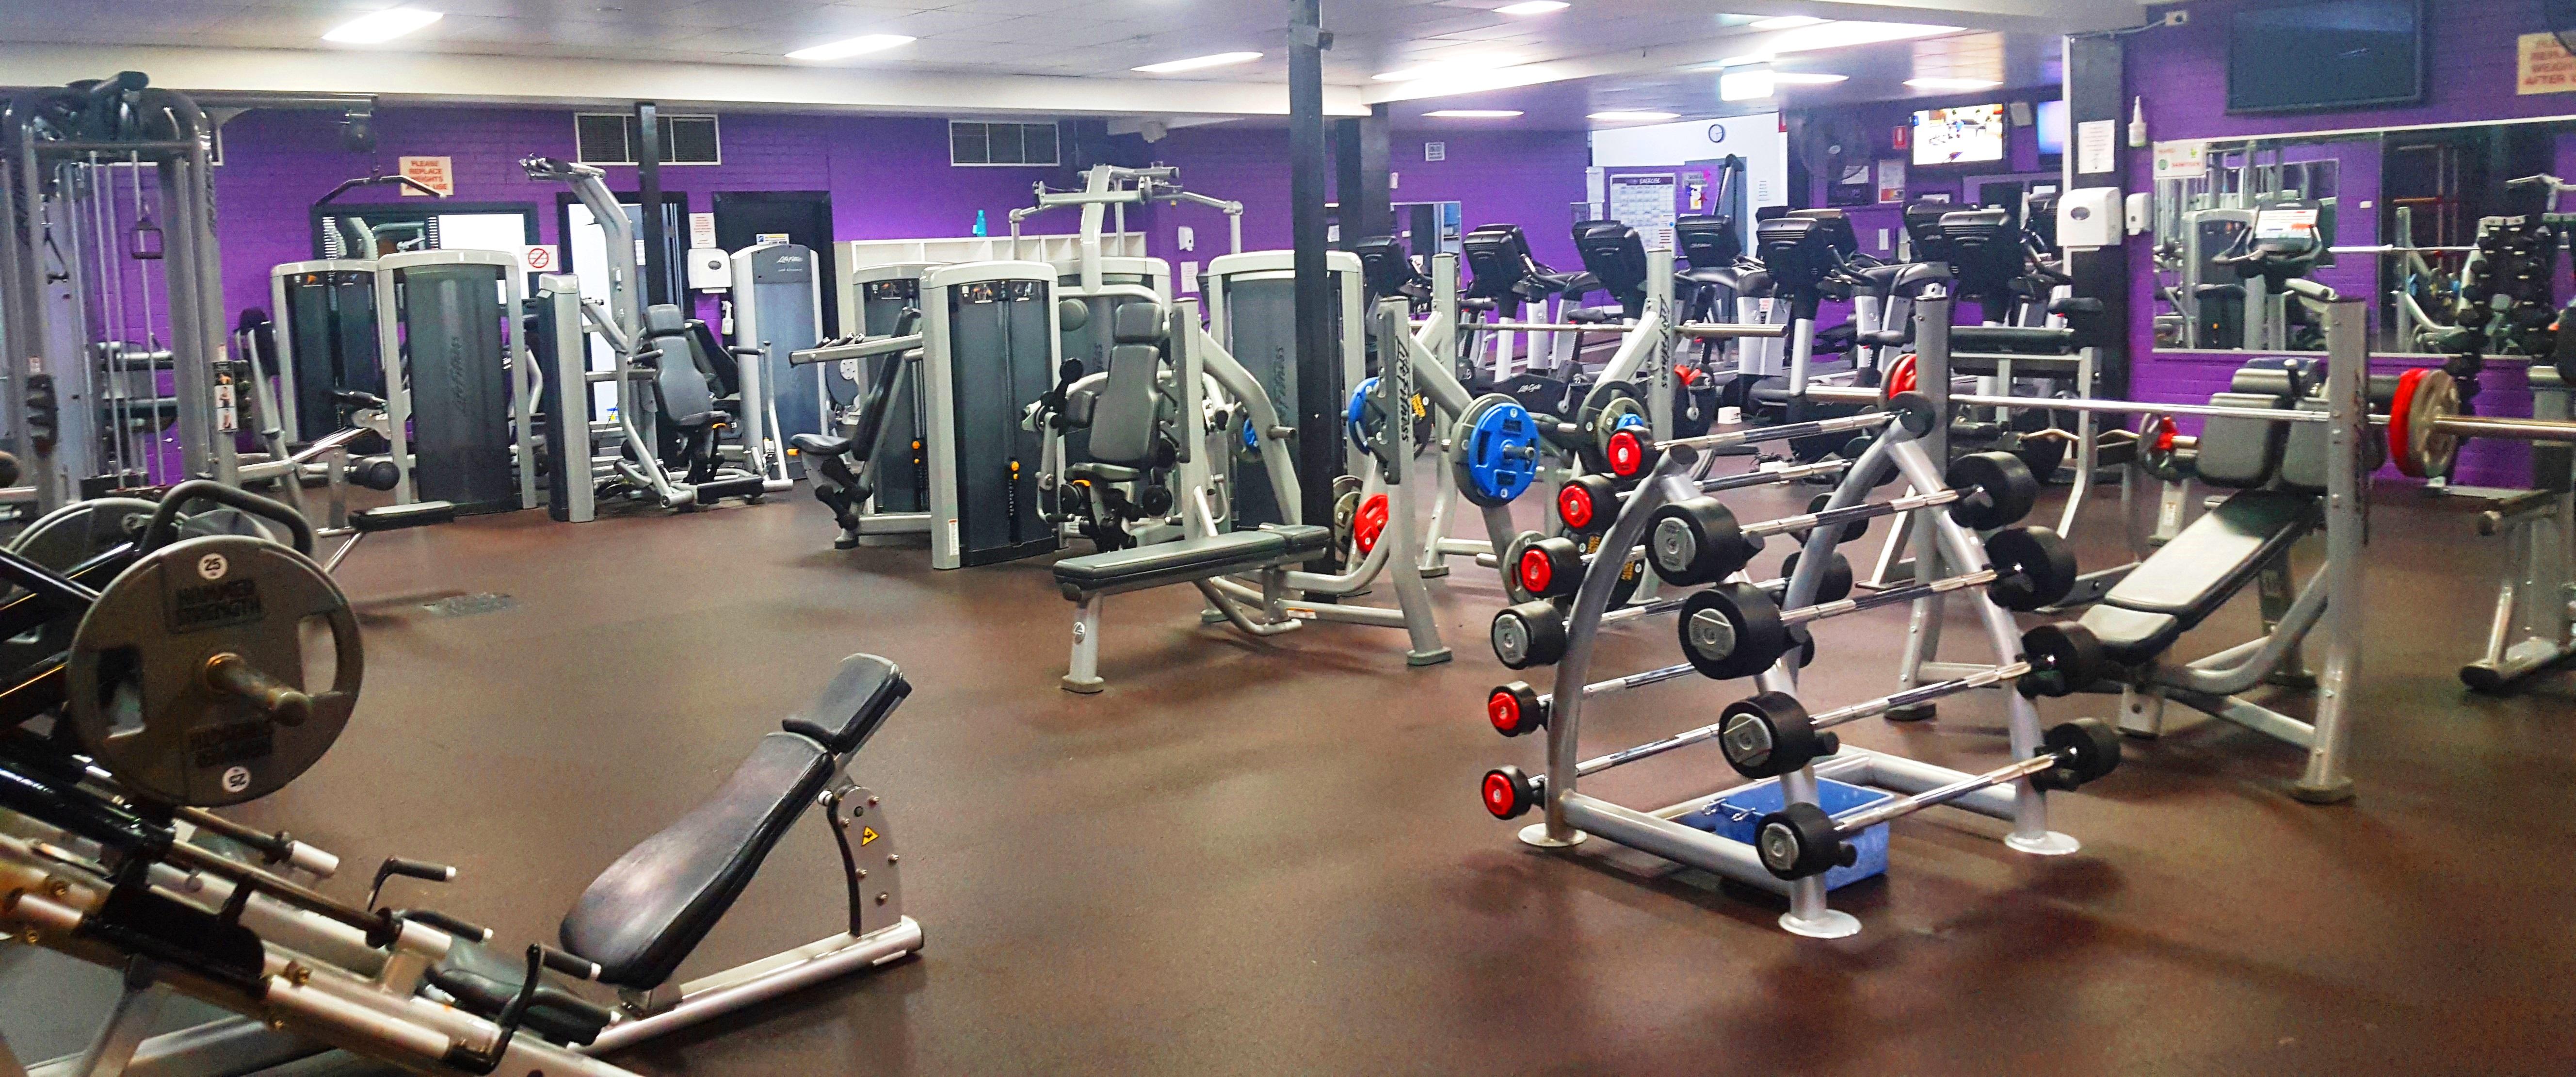 Gym Cardio Equipment